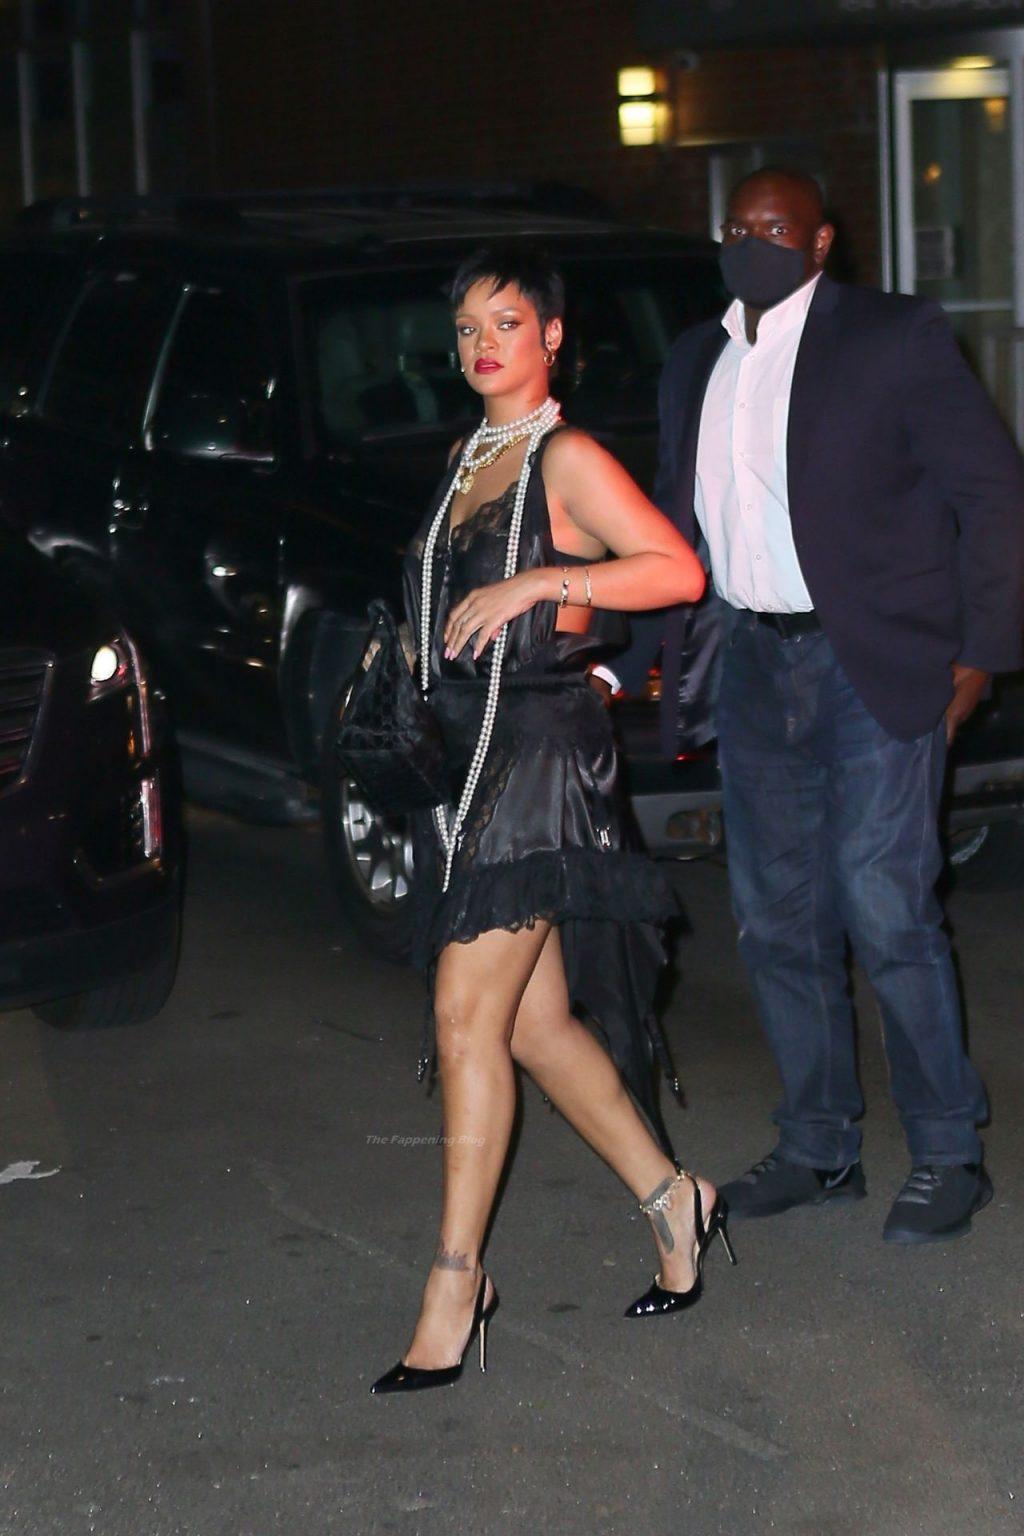 Leggy Rihanna Heads to Dinner at Carbone Italian Restaurant in NYC (16 Photos)